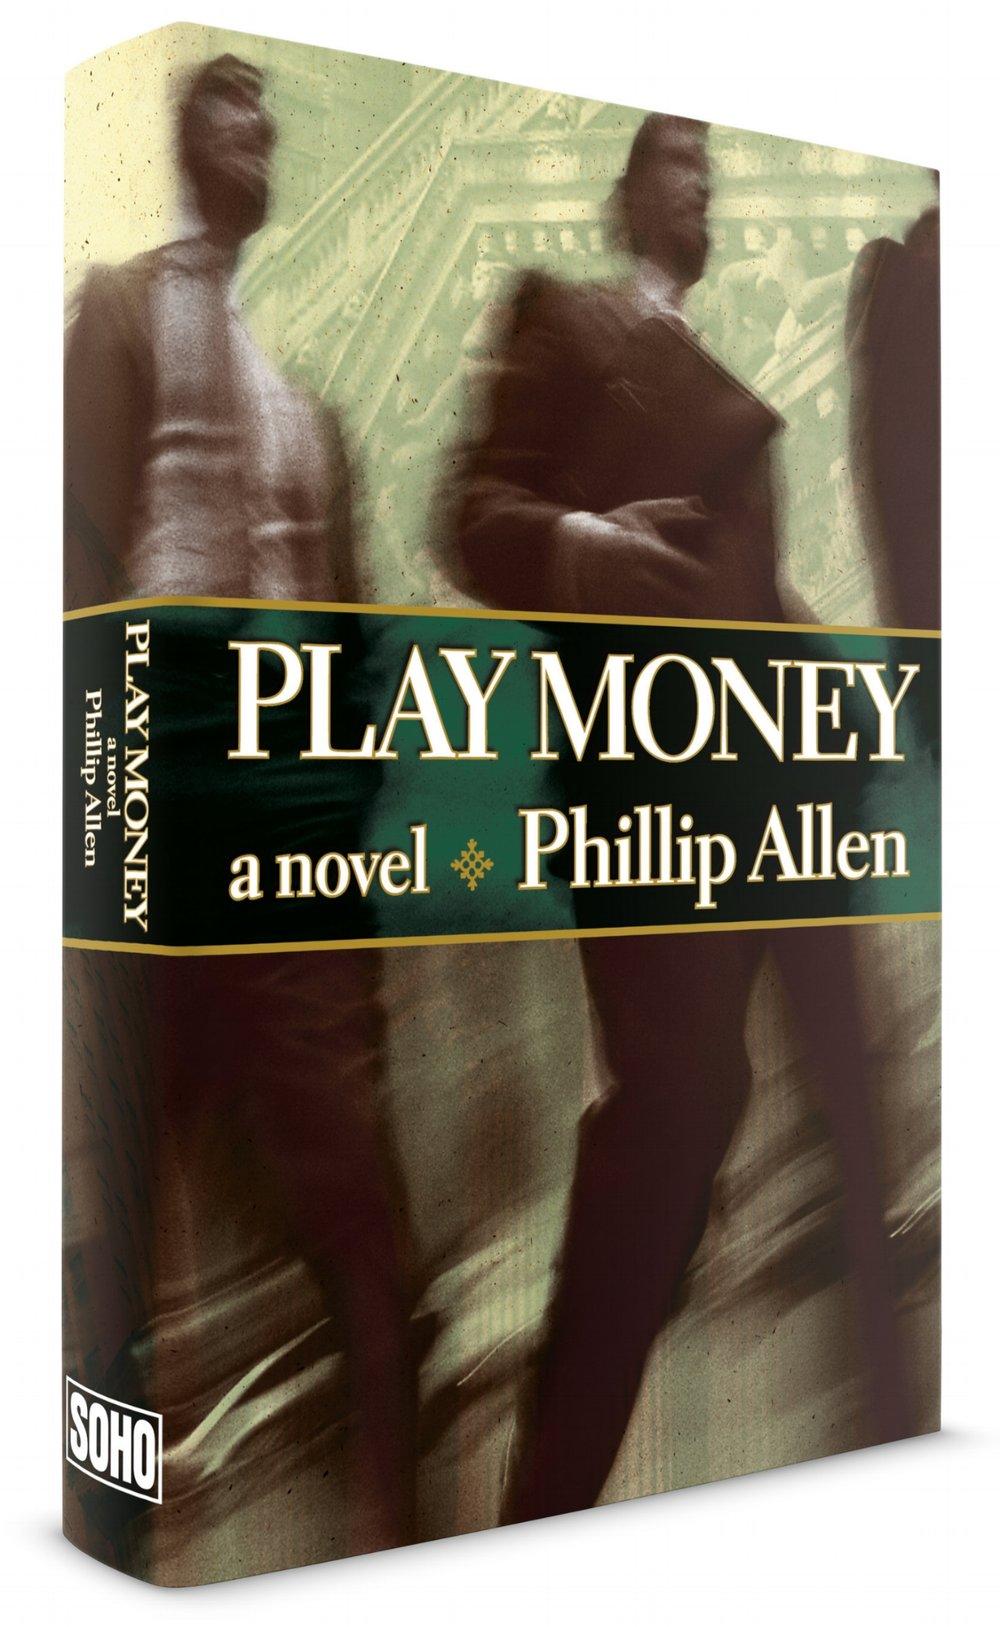 Playt Money Jacket.jpg